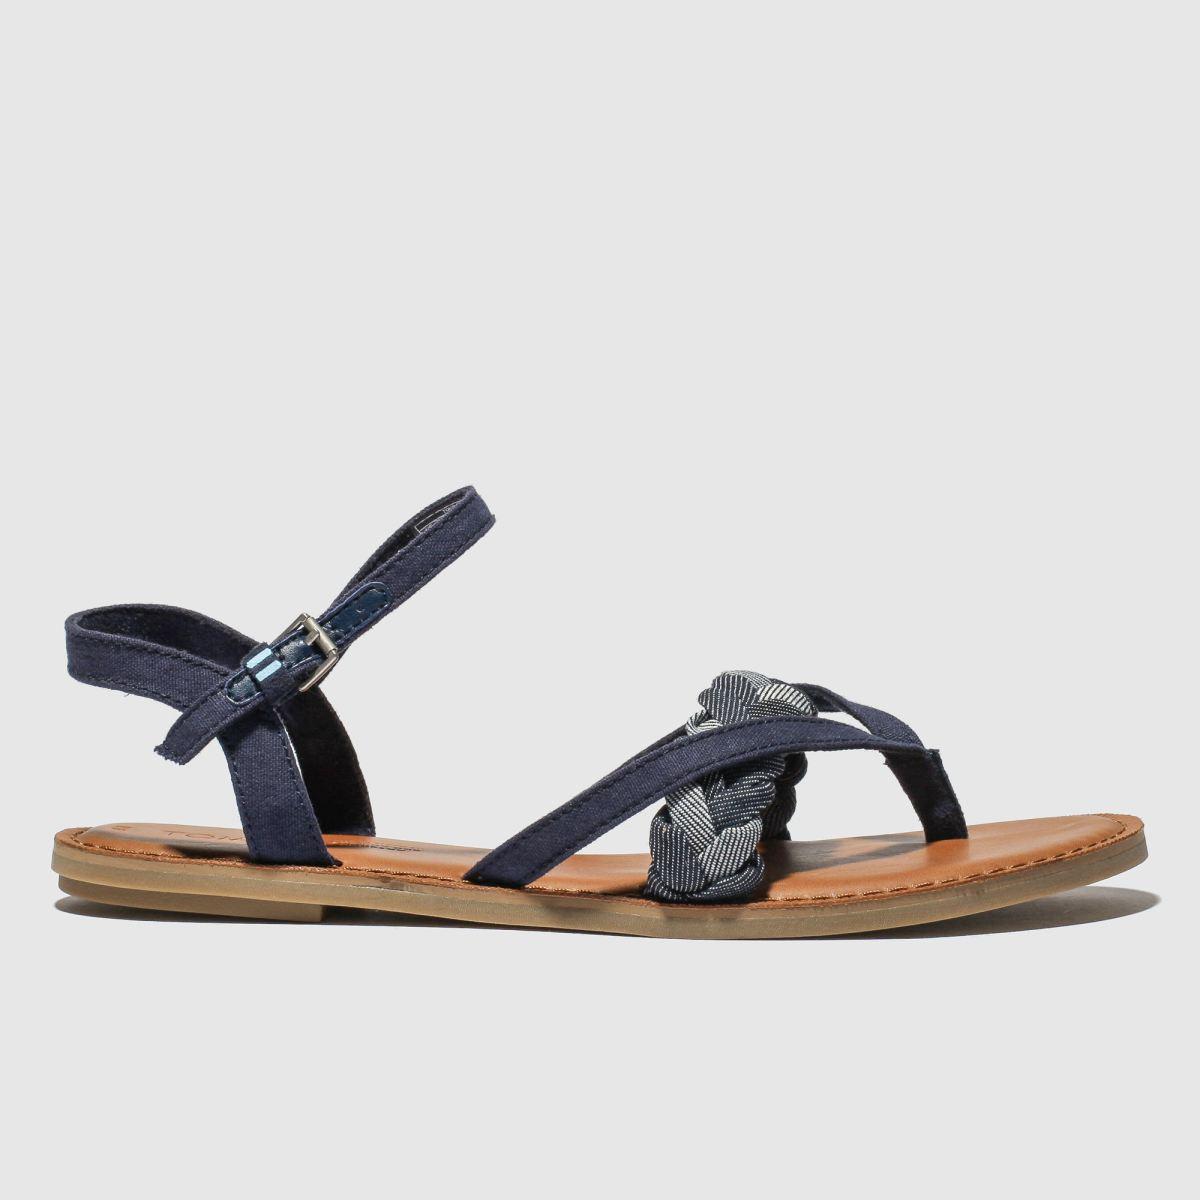 Toms Navy Lexie Vegan Sandals